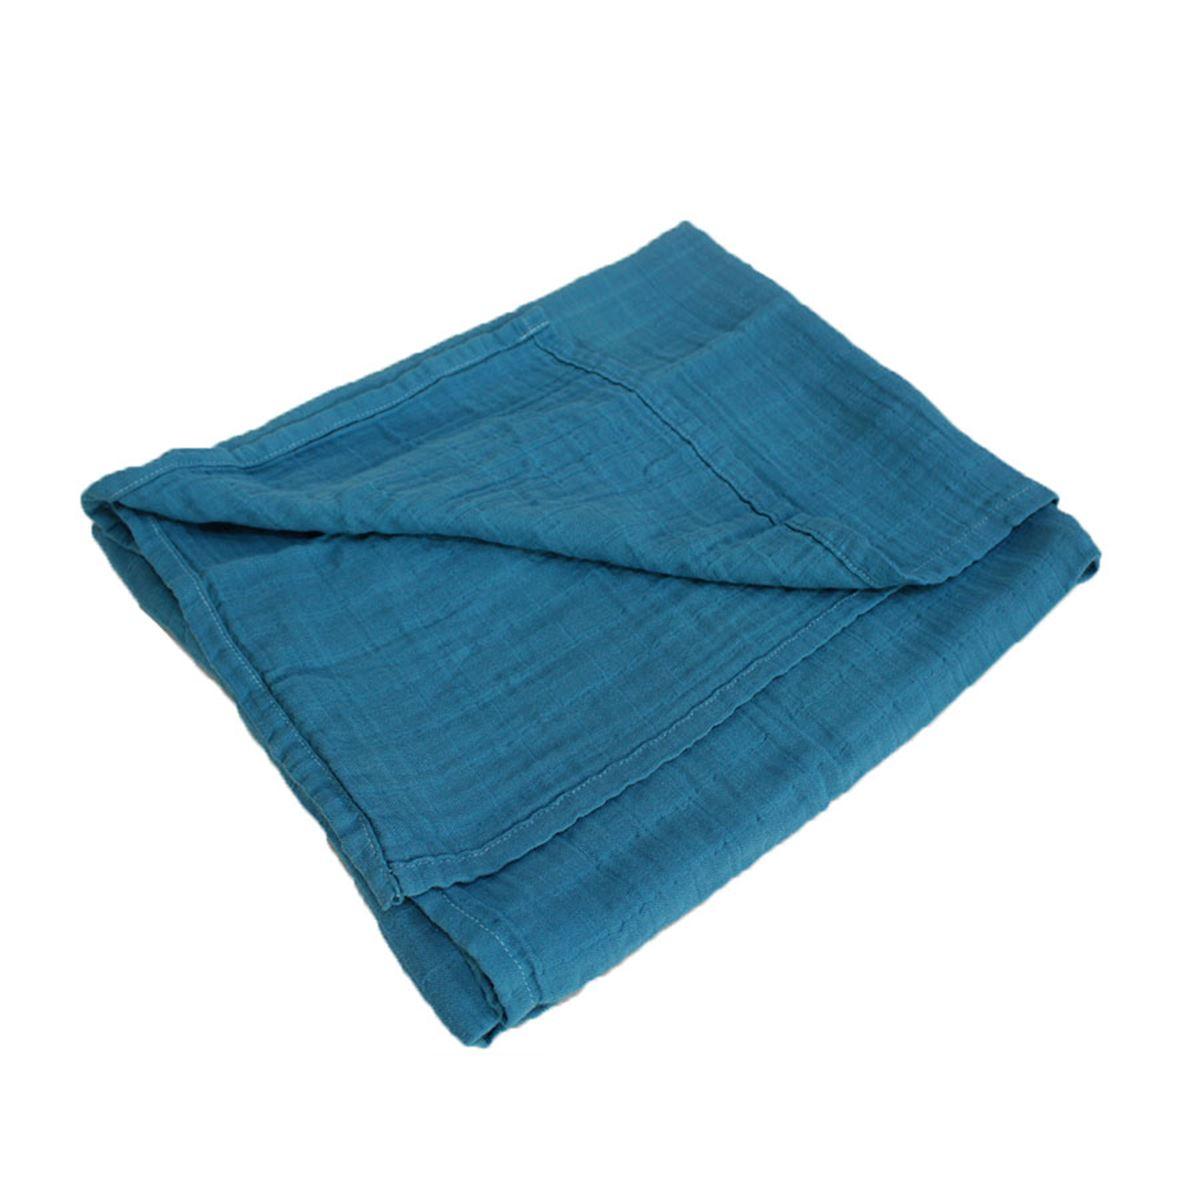 Mukabo Organik Müslin Battaniye Kundak Mavi